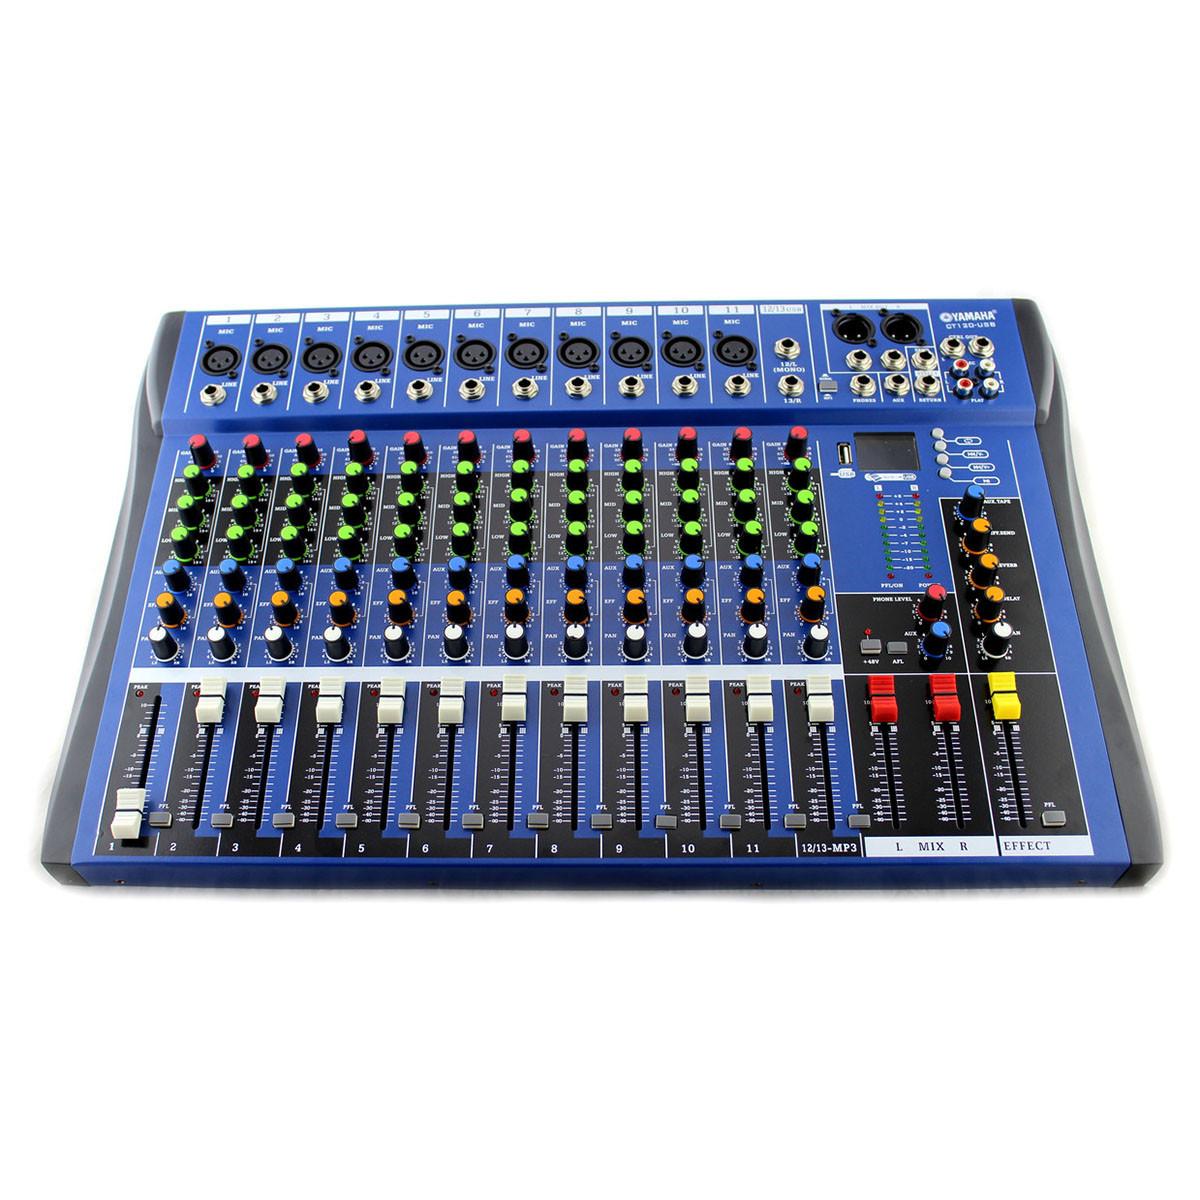 Аудио микшер Mixer 12USB   CT12 Ямаха 12 канальный (Арт:6820/5682)